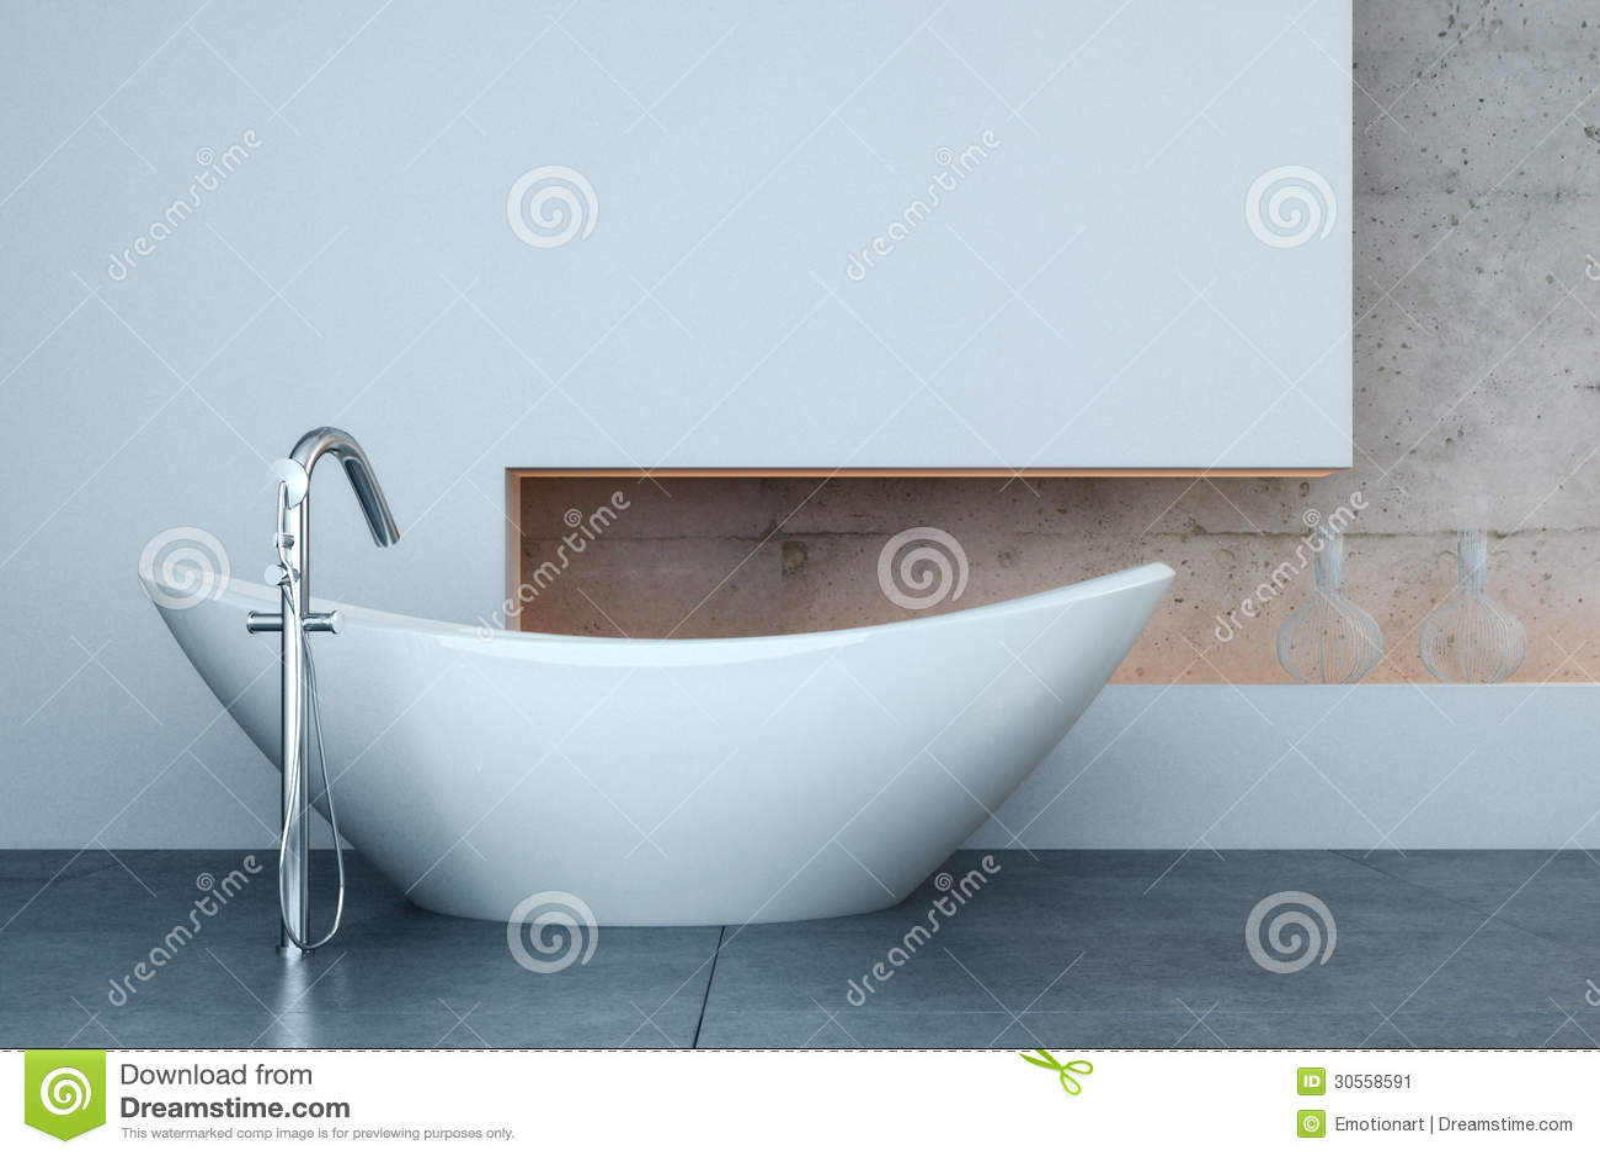 baignoire moderne devant le mur blanc image stock image 30558591. Black Bedroom Furniture Sets. Home Design Ideas